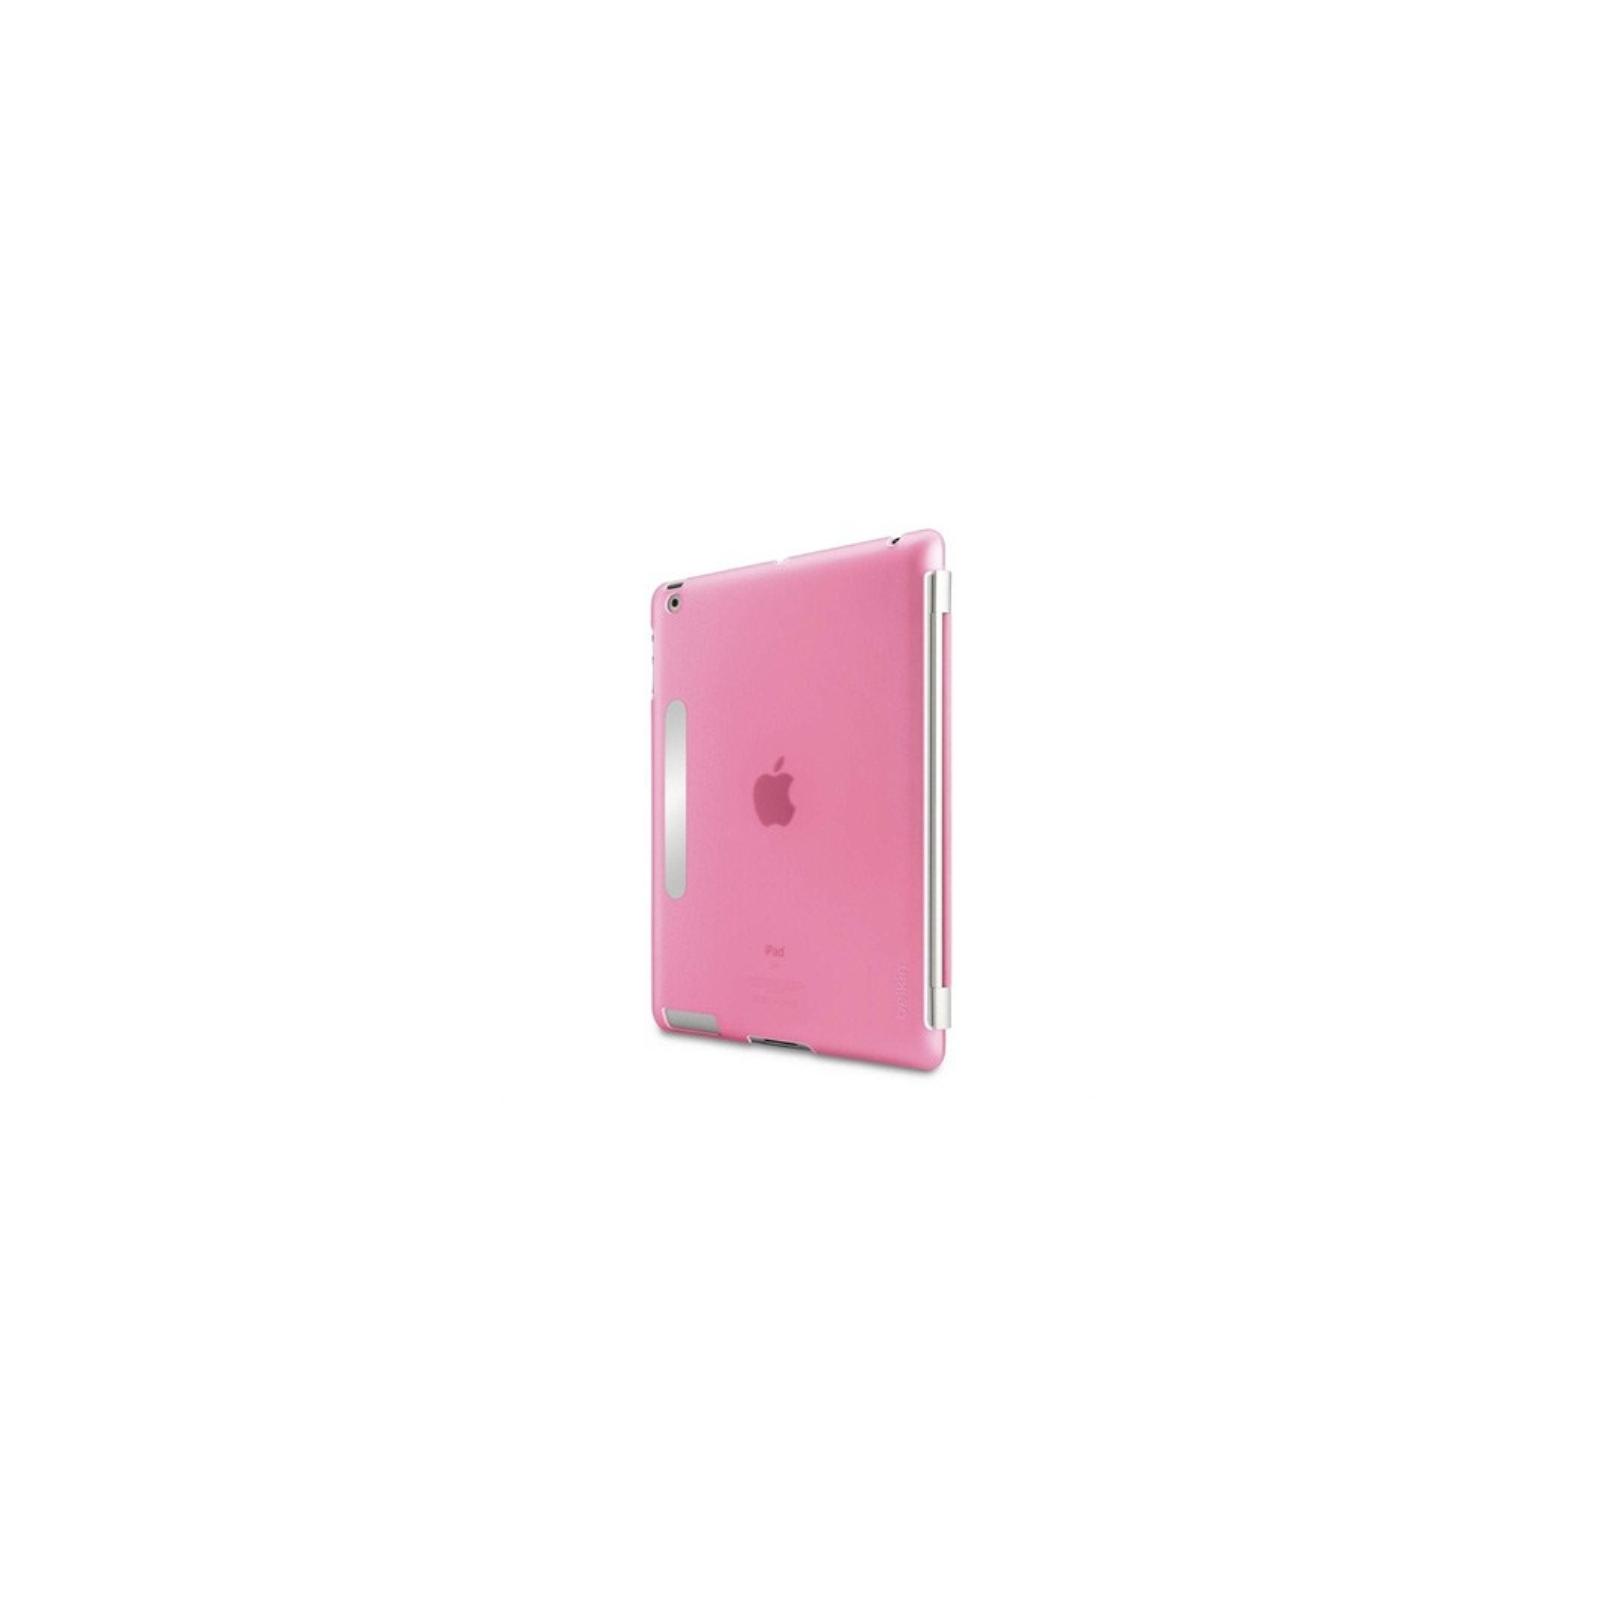 Чехол для планшета Belkin iPad2, iPad3, iPad4 Snap Shield Secure (Pink) (F8N745cwC04)